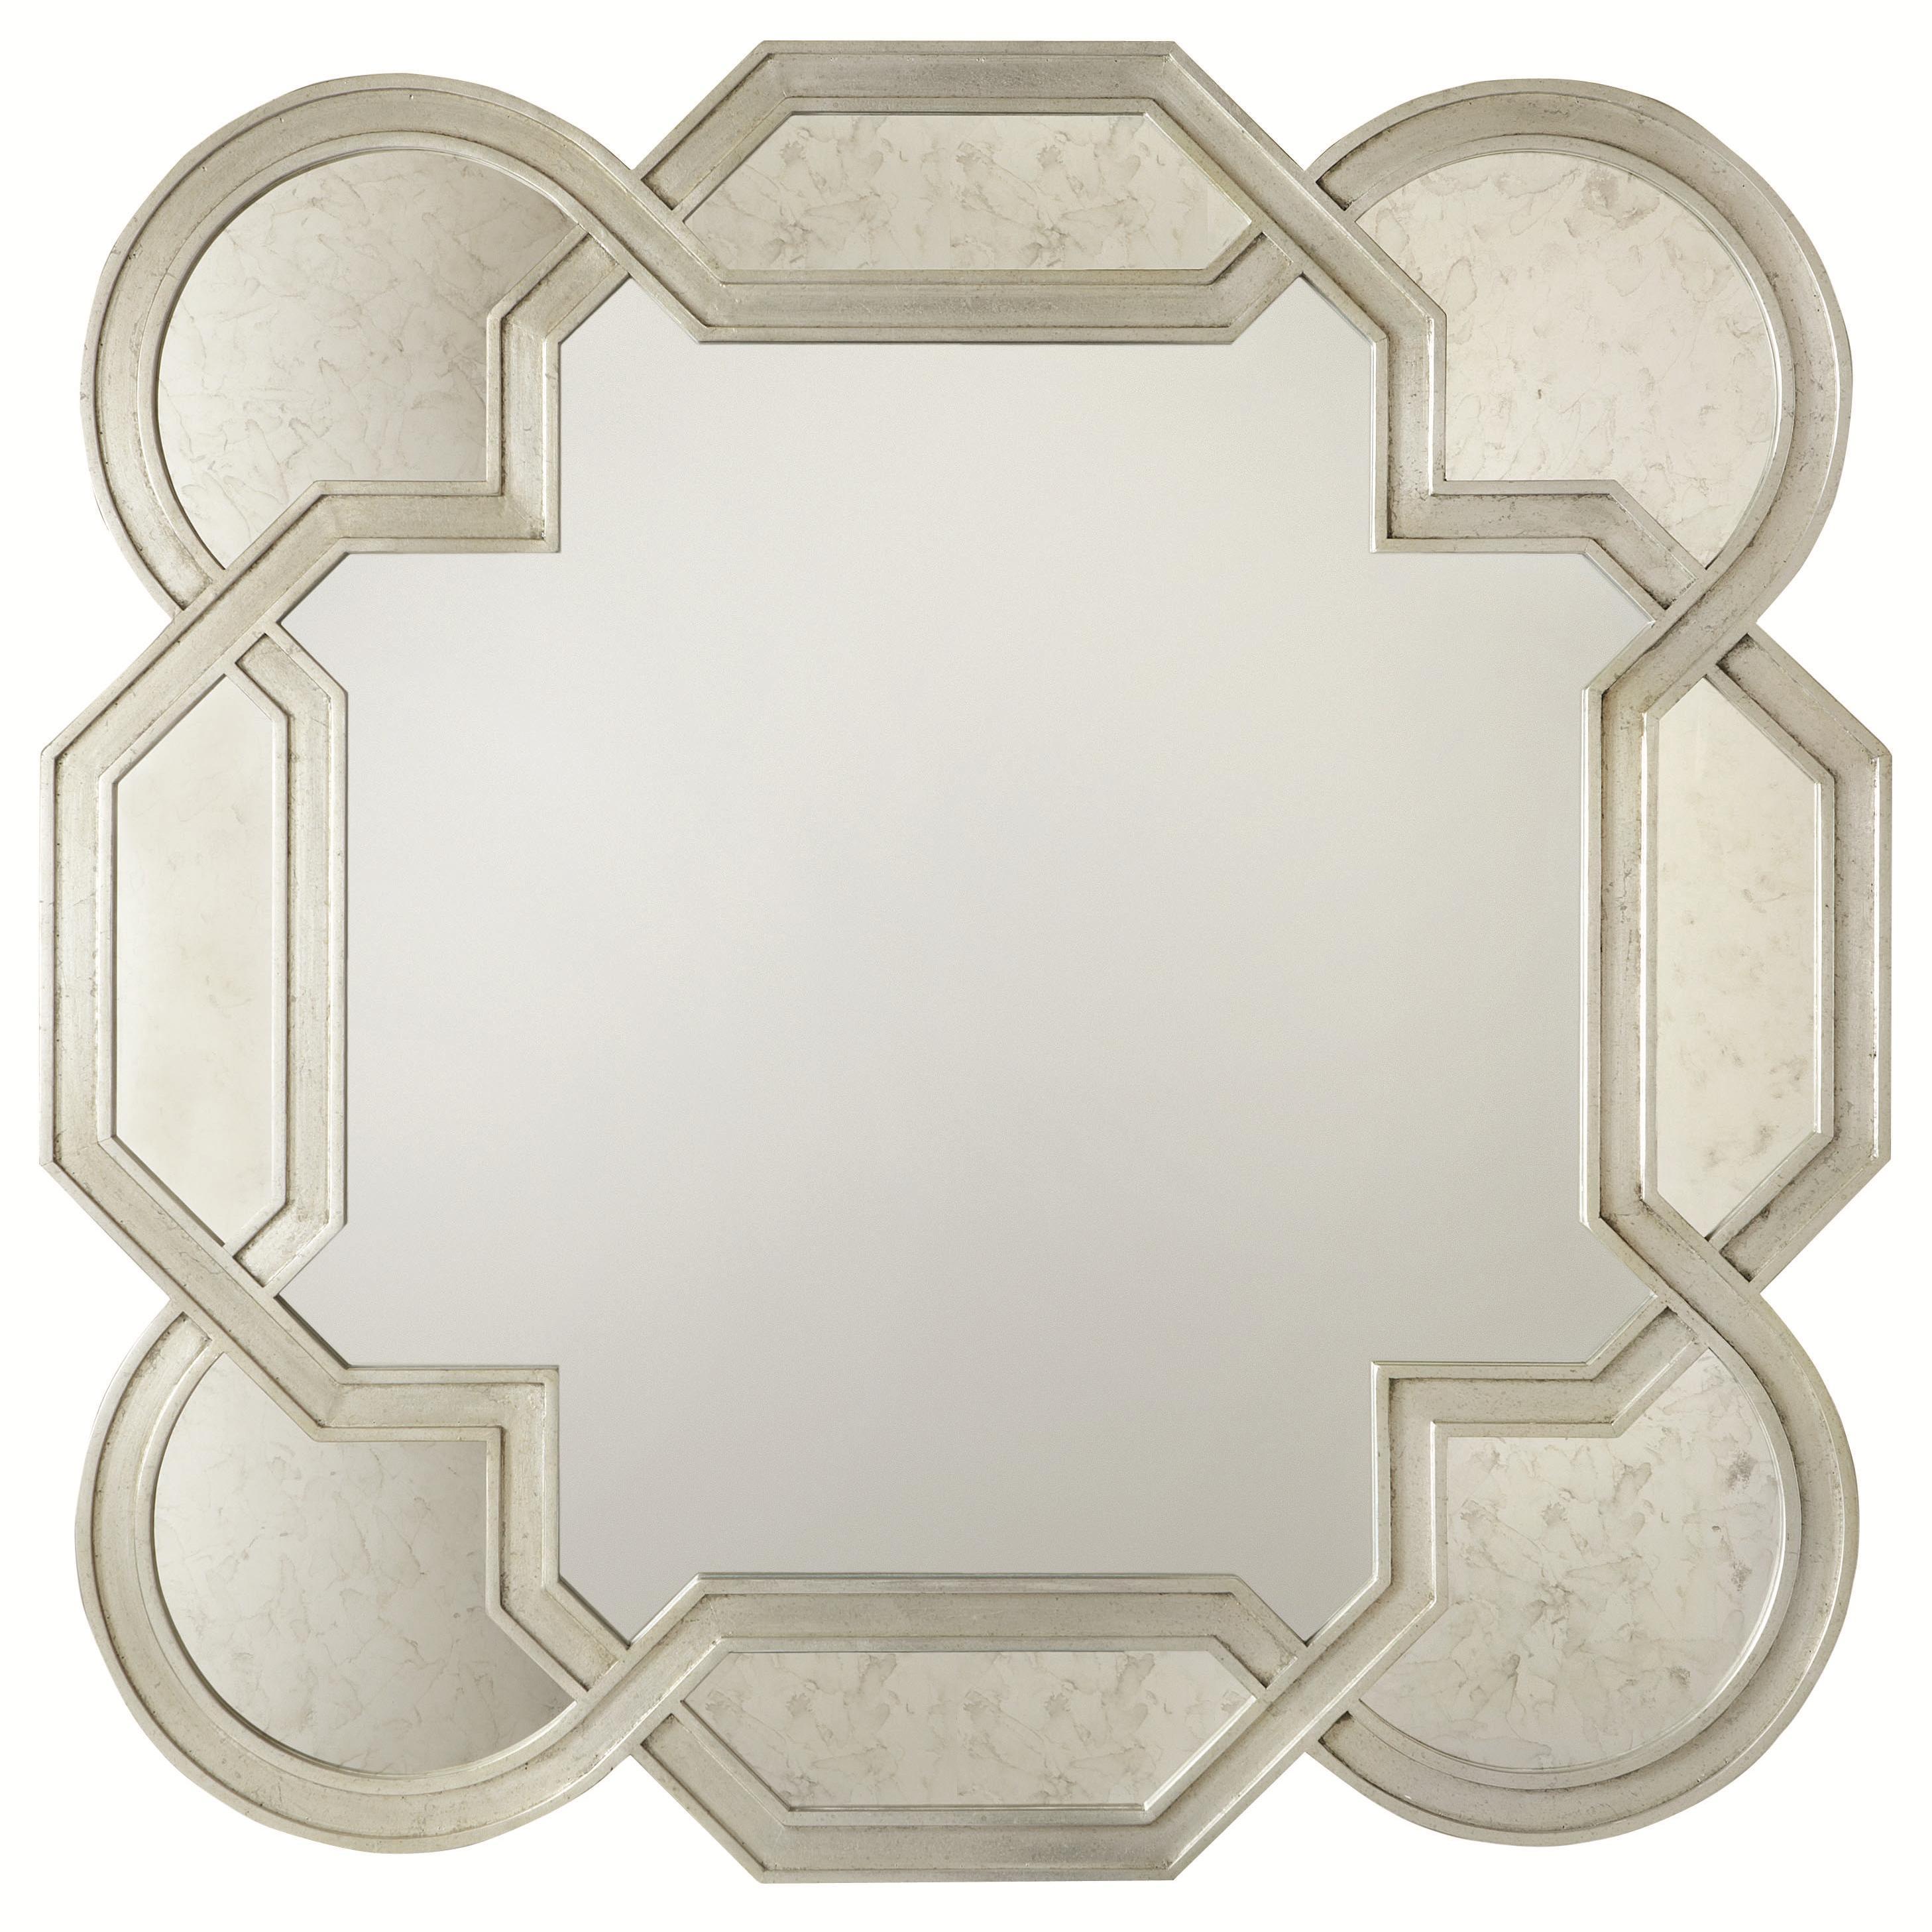 Bernhardt Salon Mirror - Item Number: 341-322S